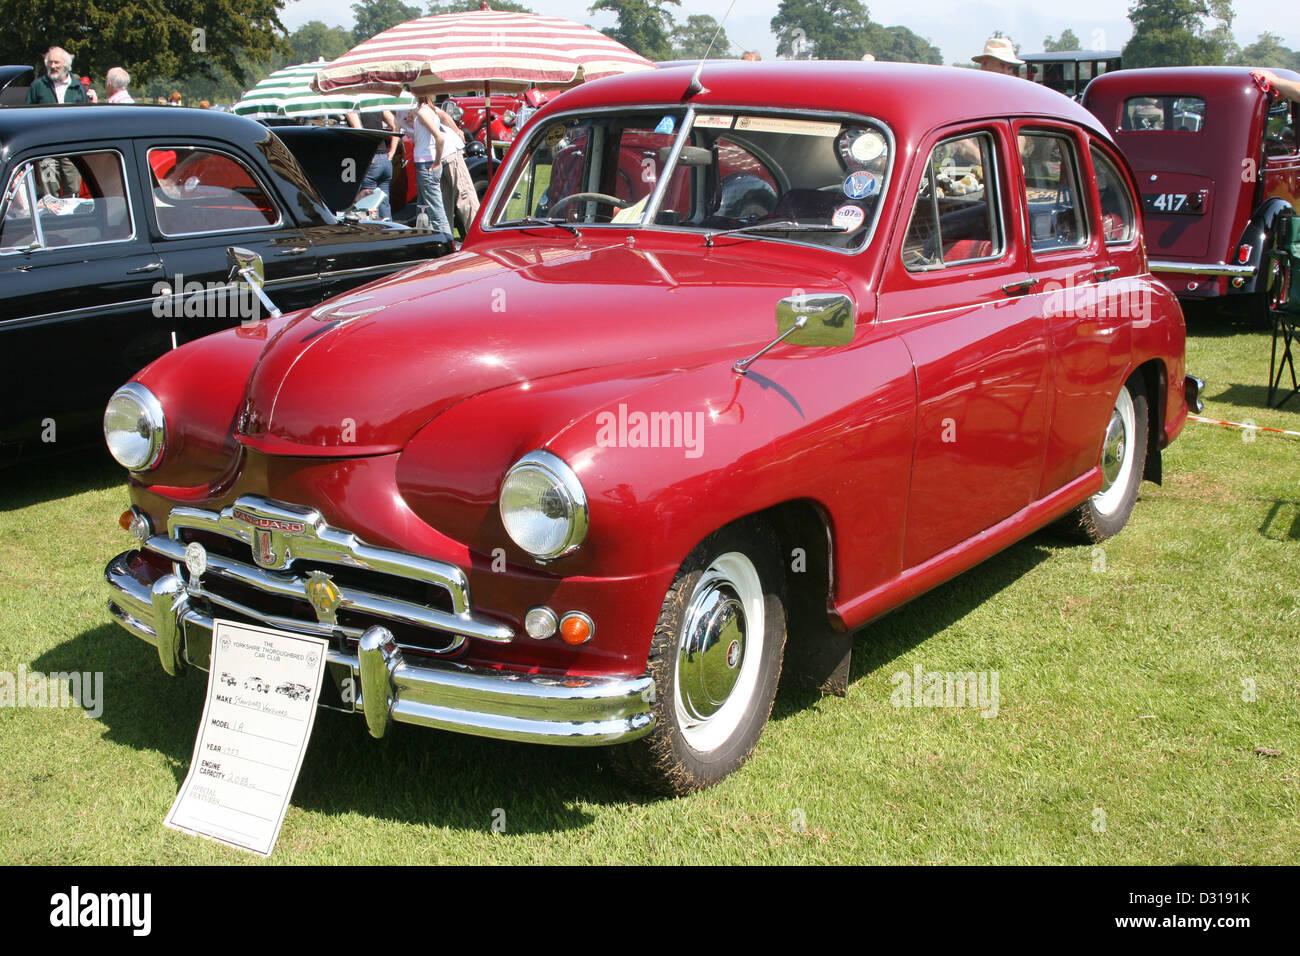 Vanguard Motor Car Stock Photo, Royalty Free Image: 53504127 - Alamy